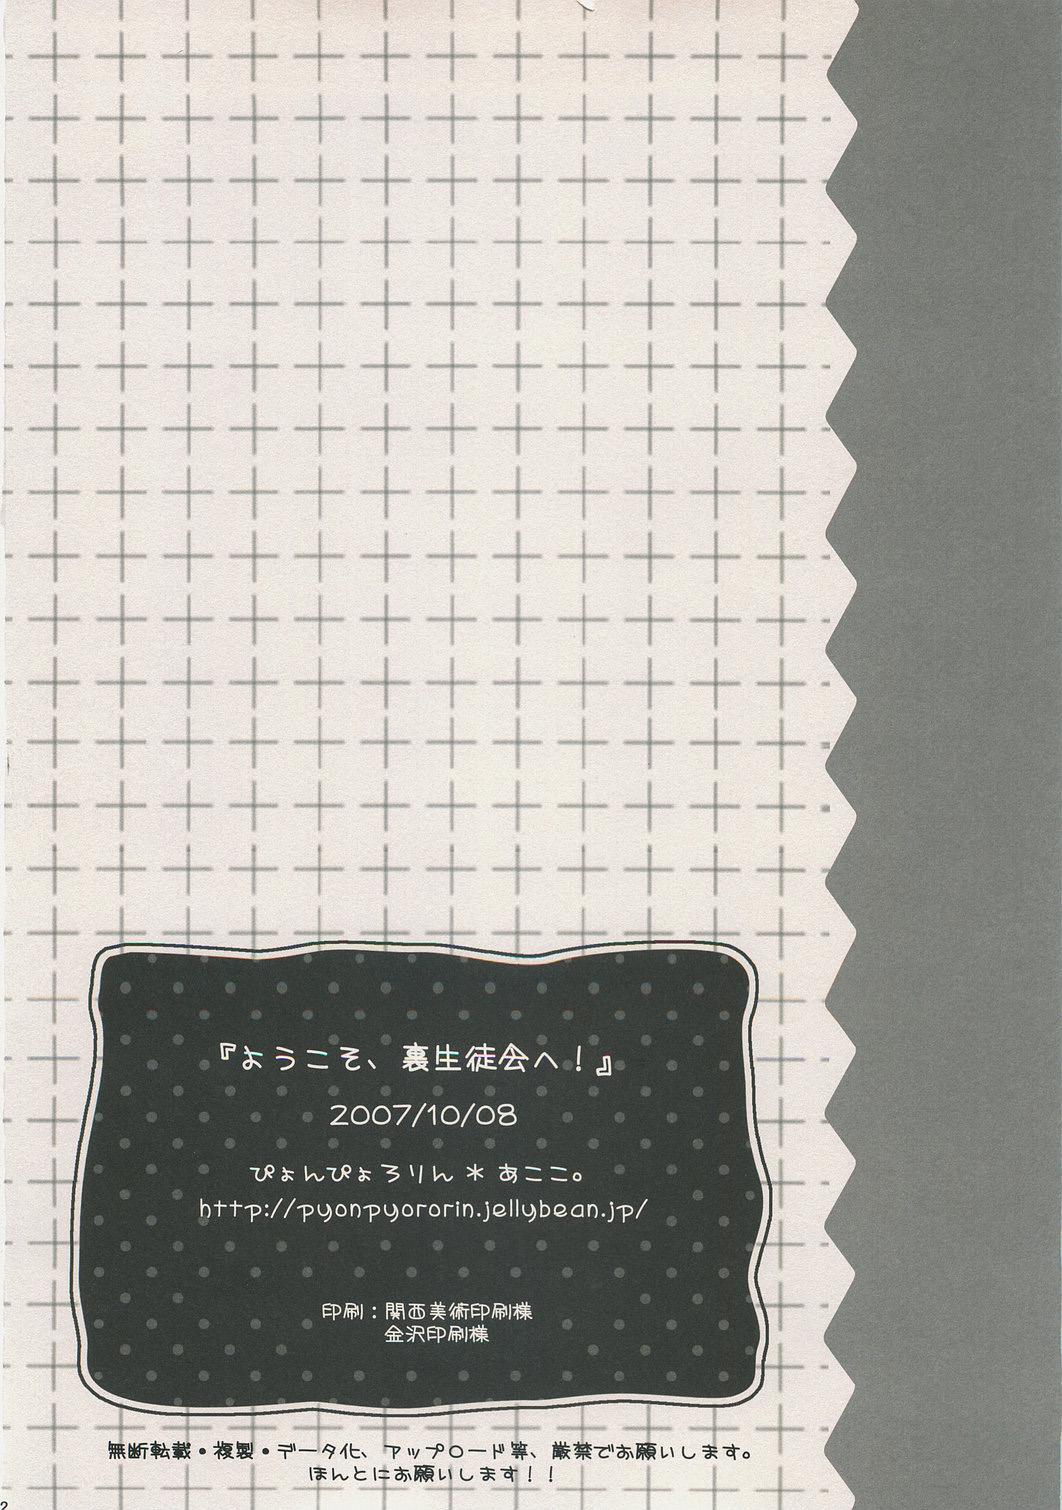 Youkoso, Ura Seitokai e! 20